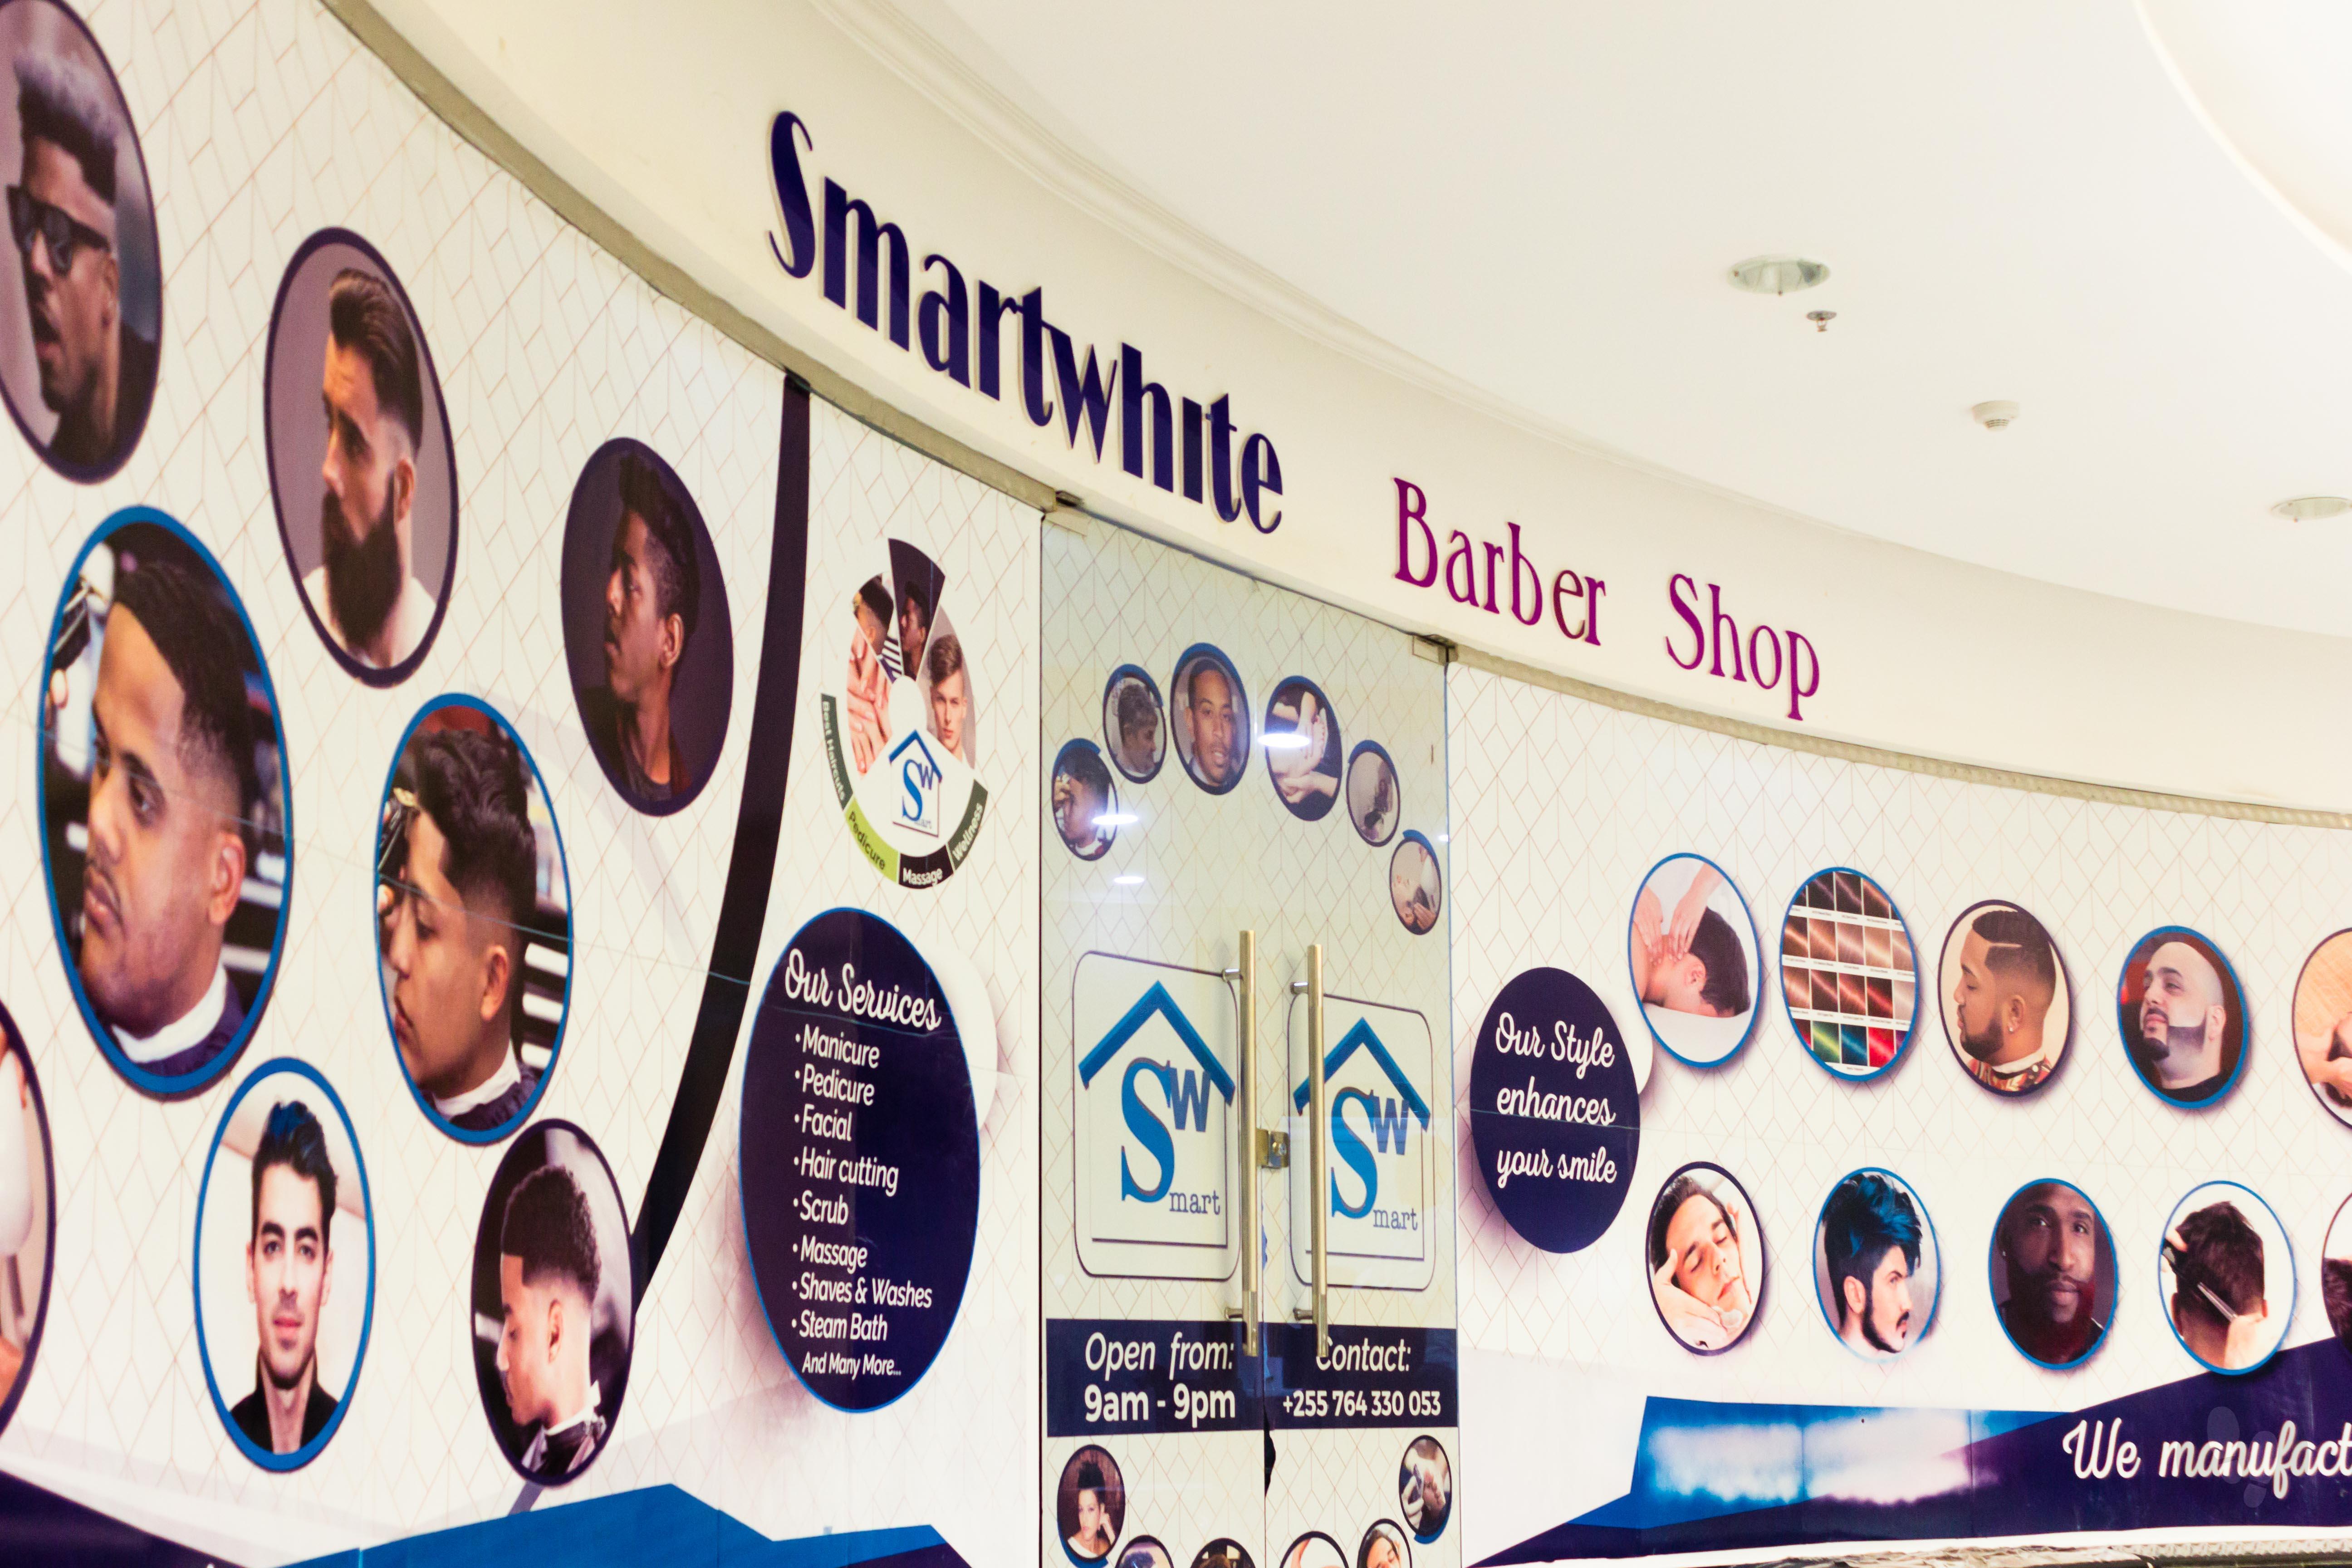 Smartwhite Barbershop